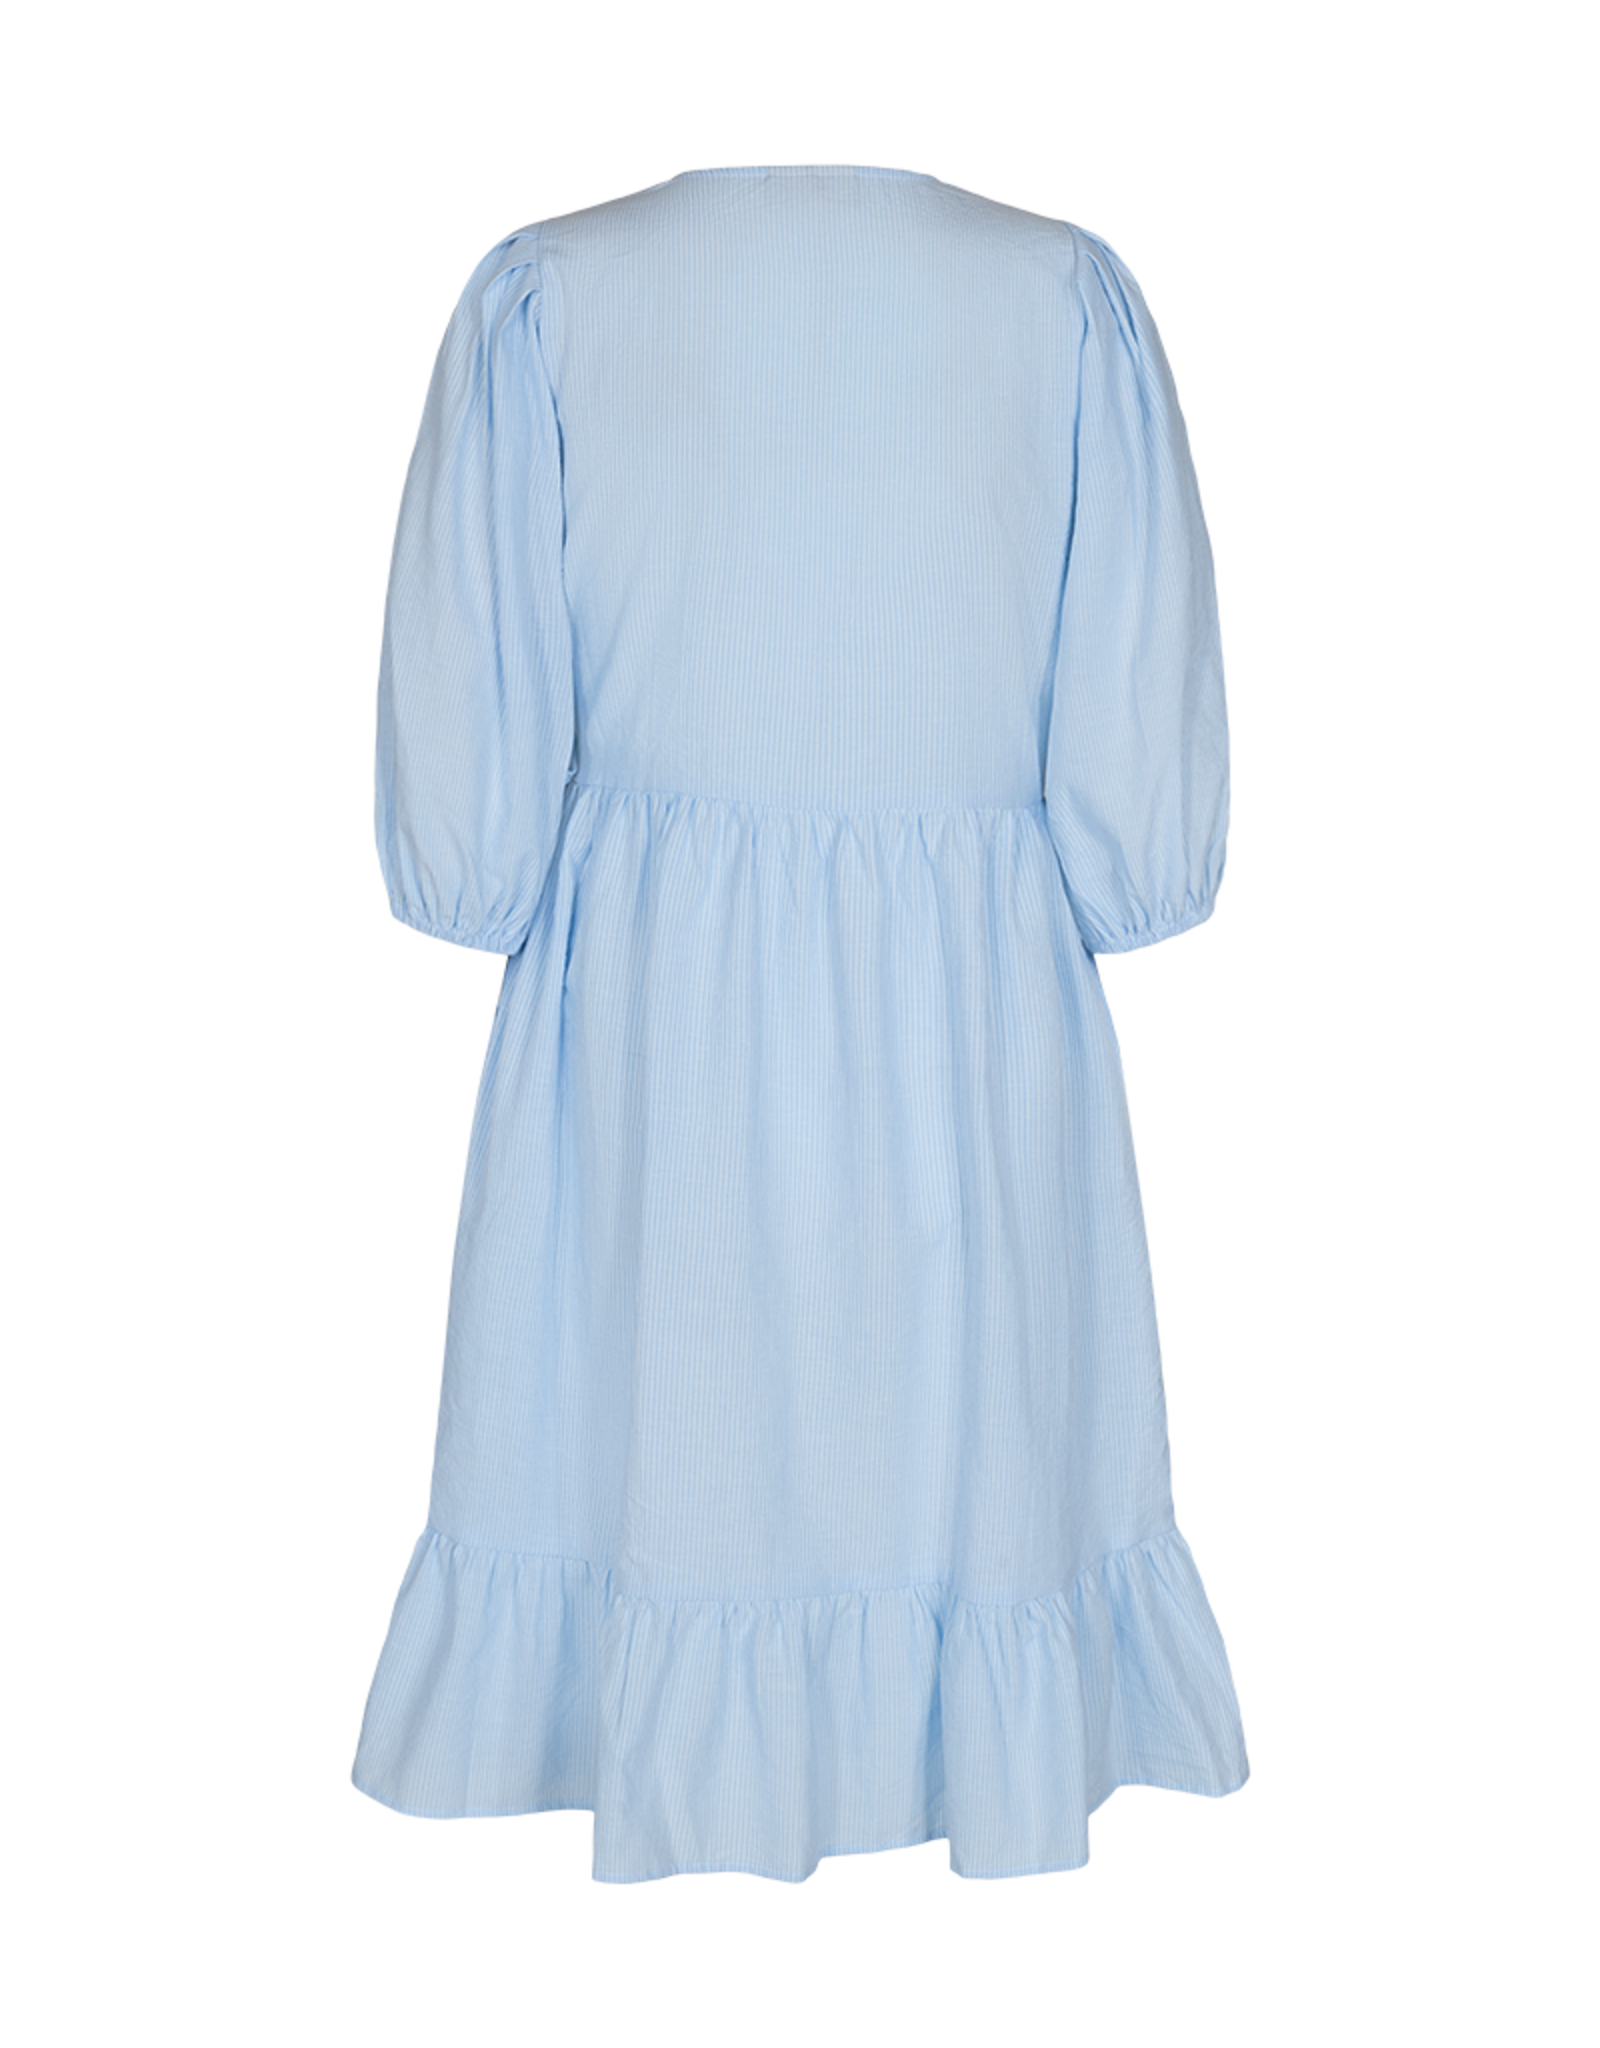 MAGNOLIA DRESS LIGHT BLUE